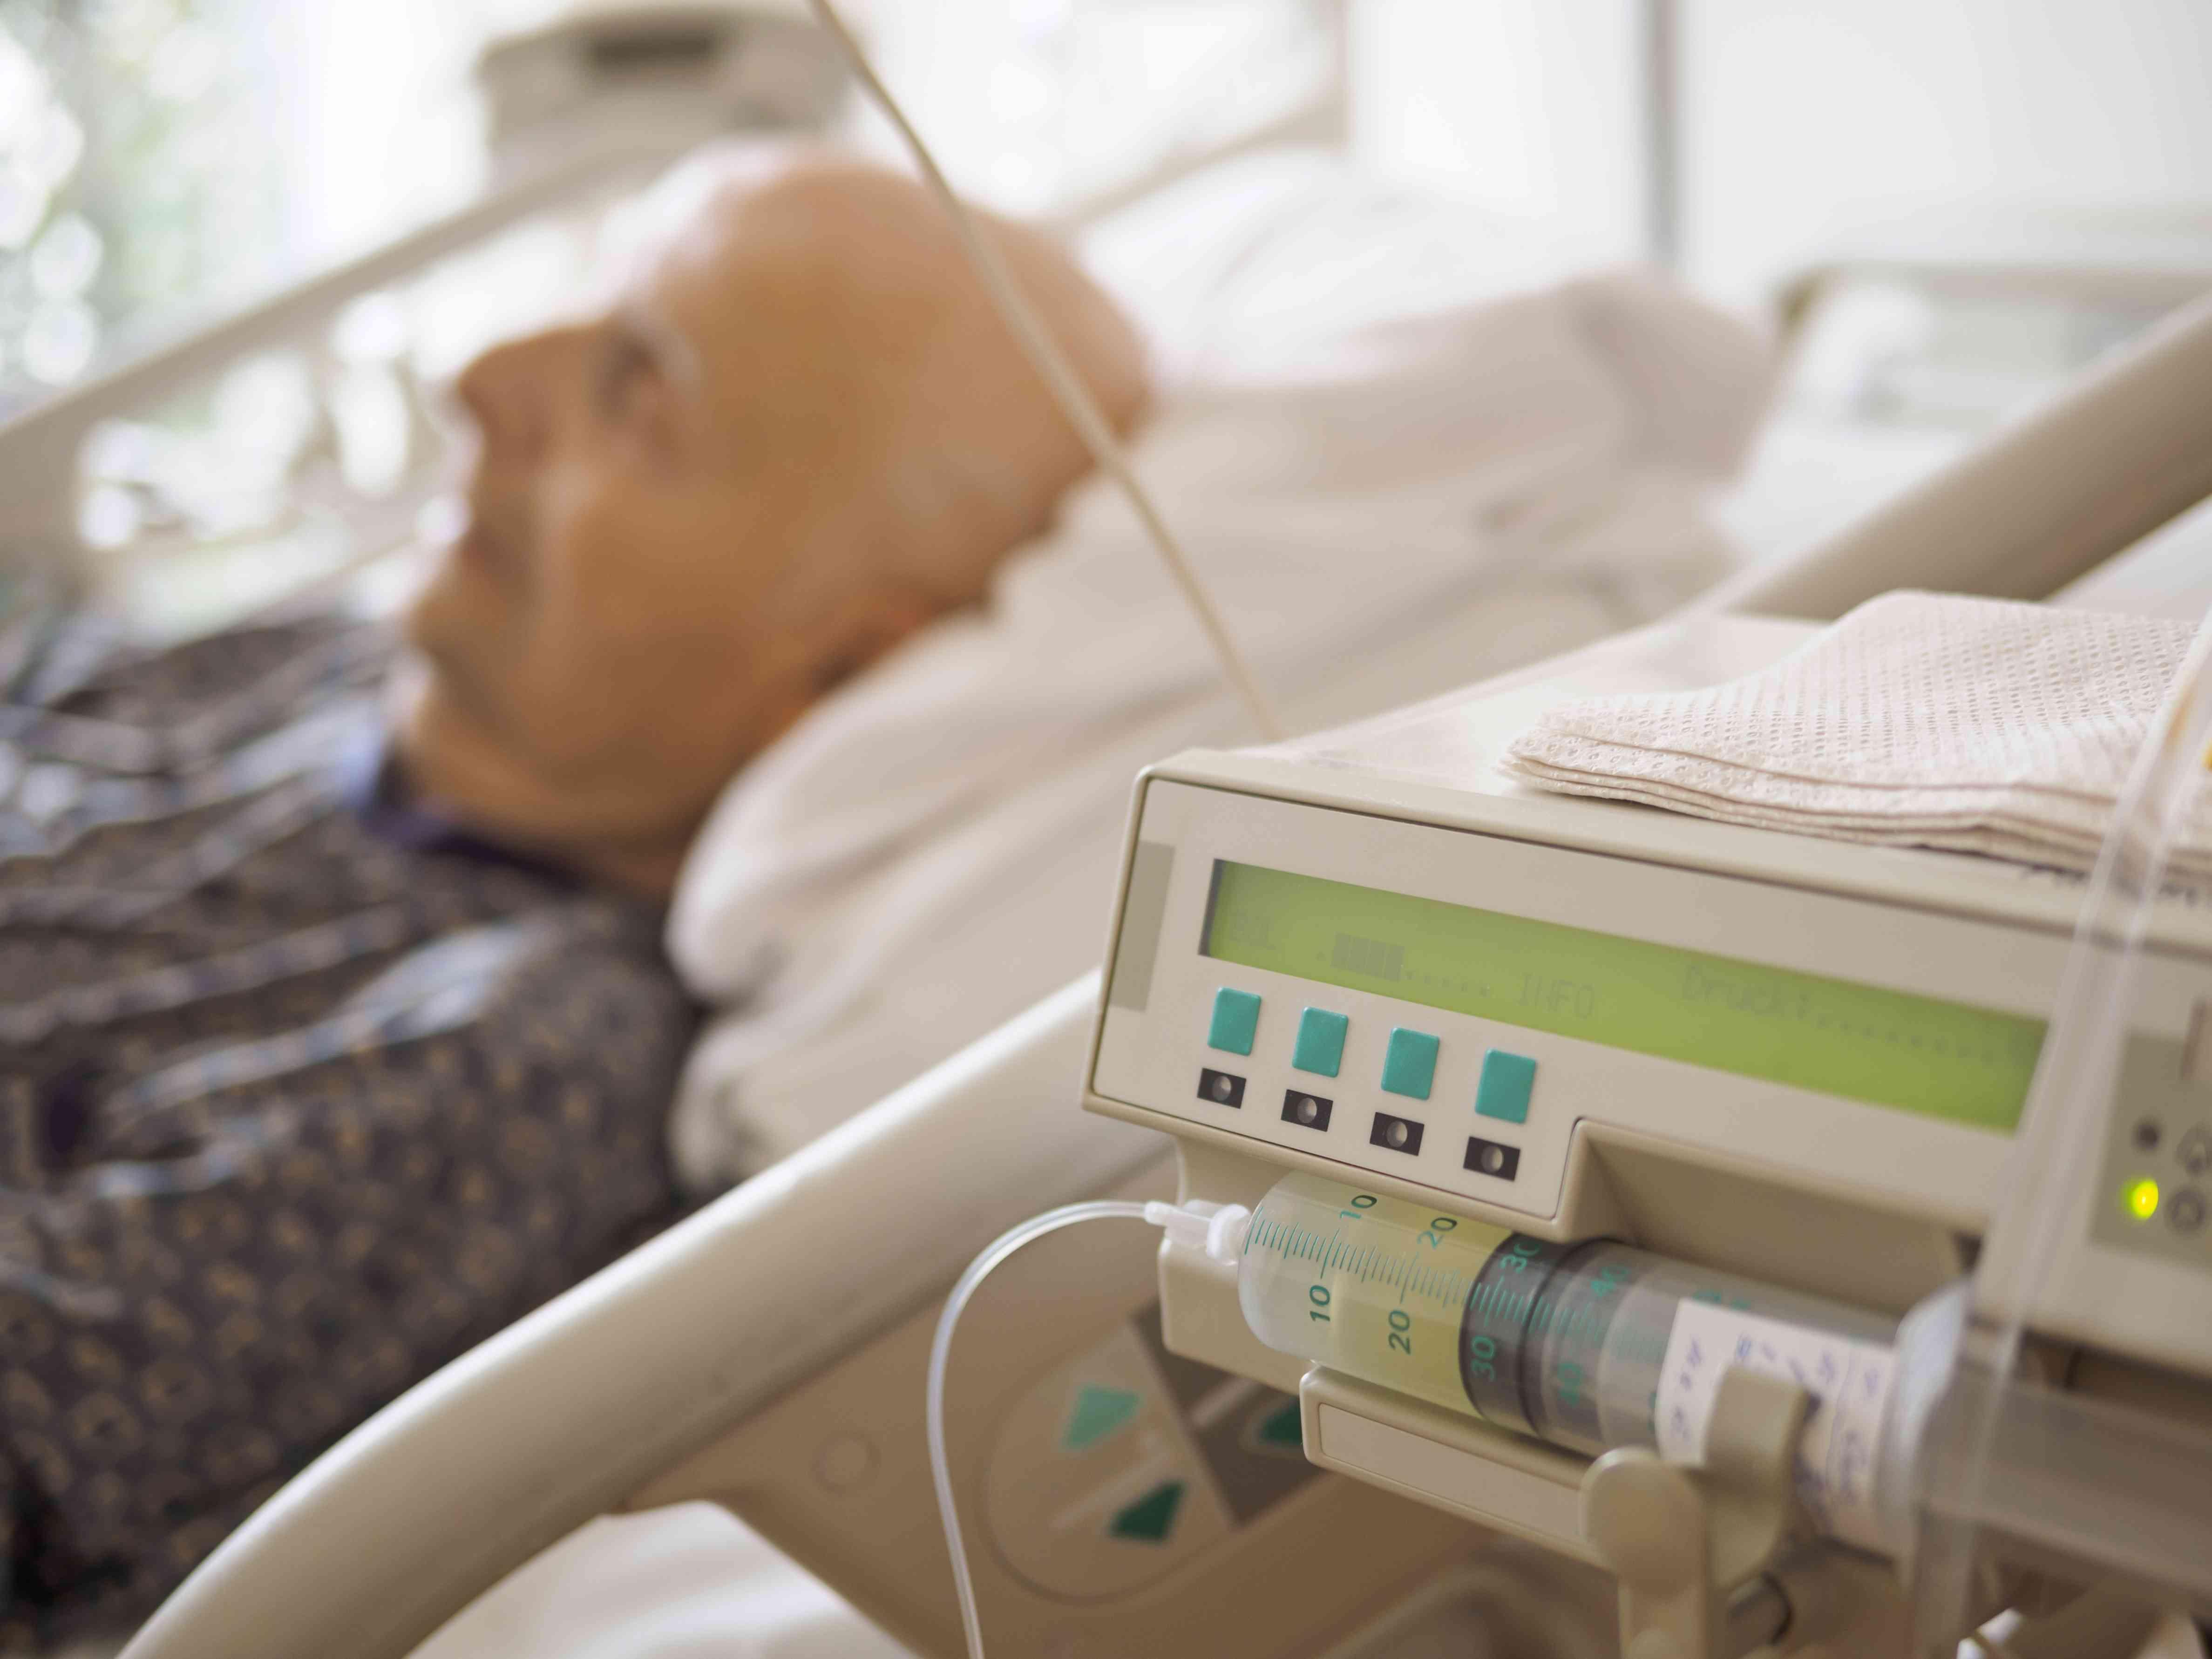 Older man at palliative care unit